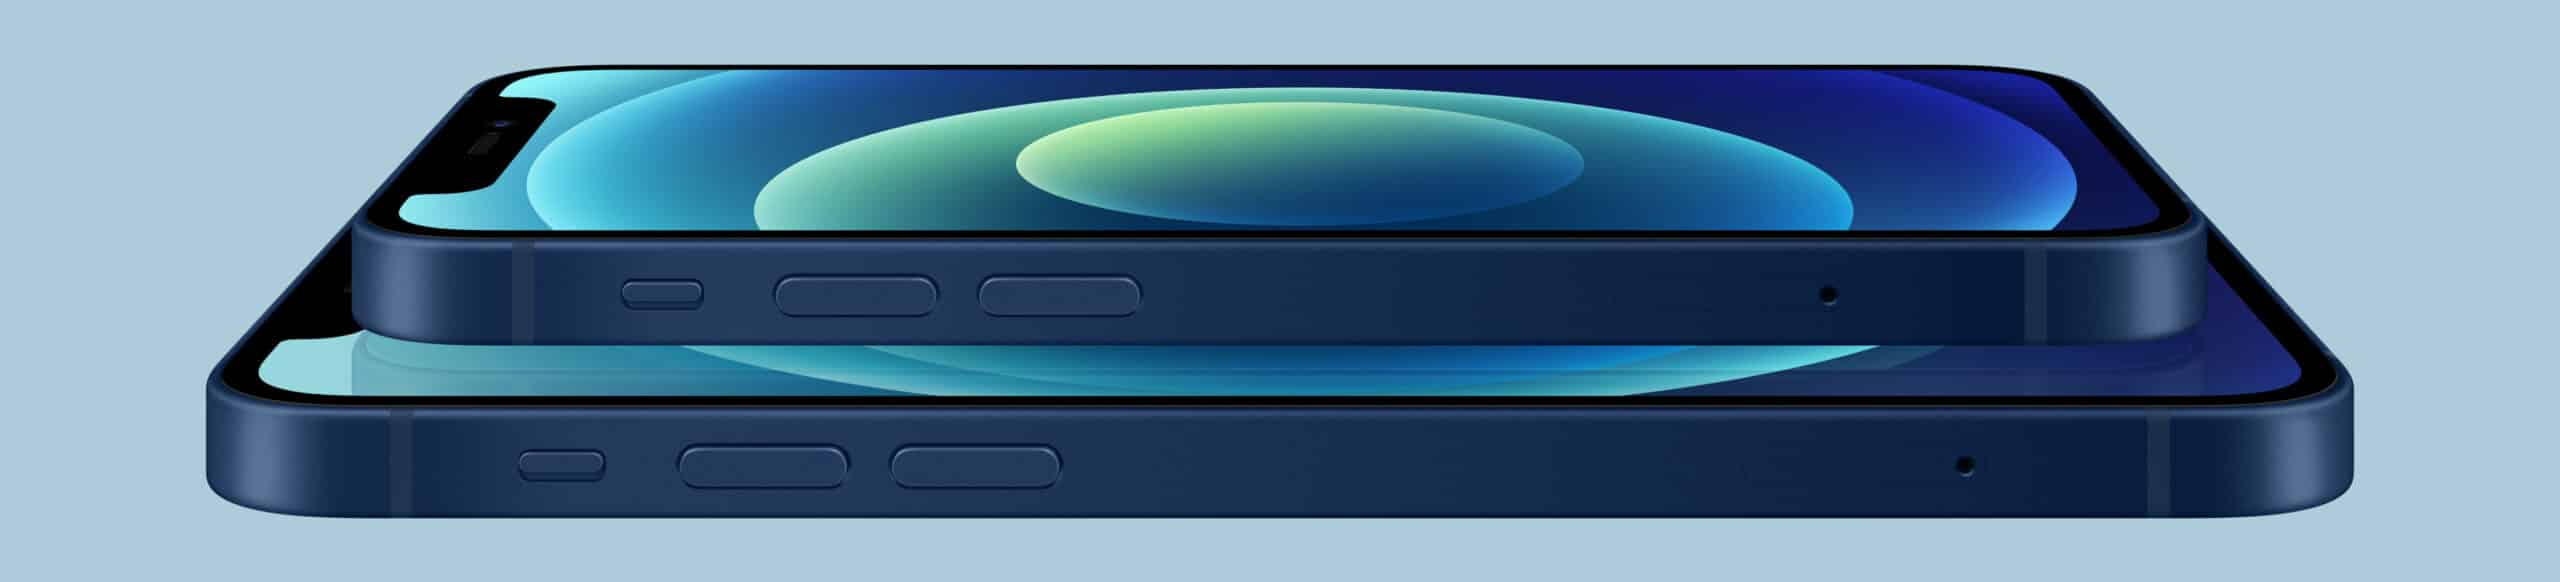 iphone12-bryla